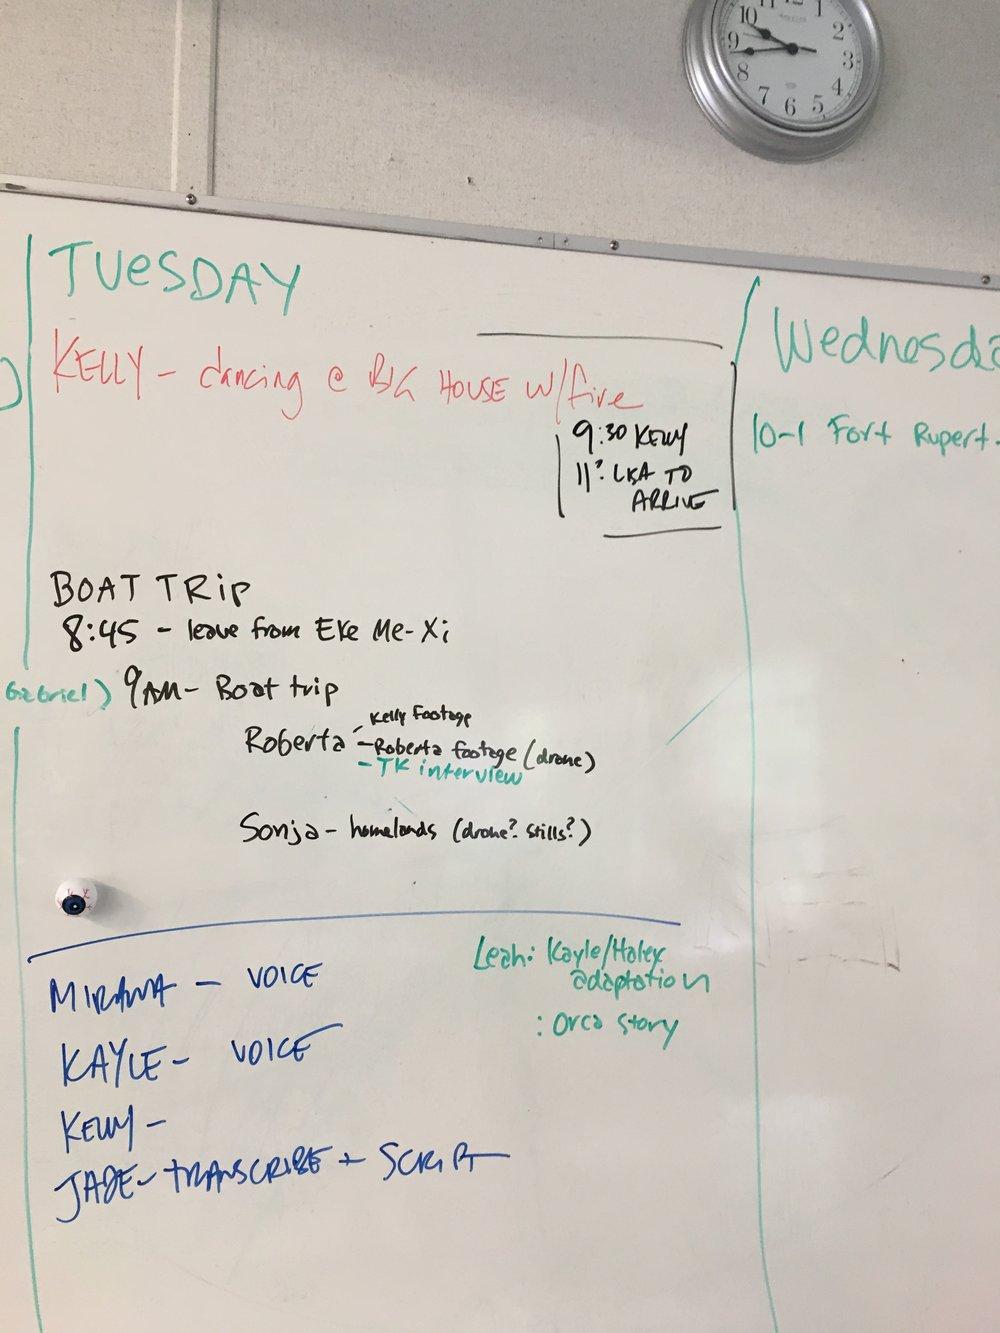 Tuesday plan